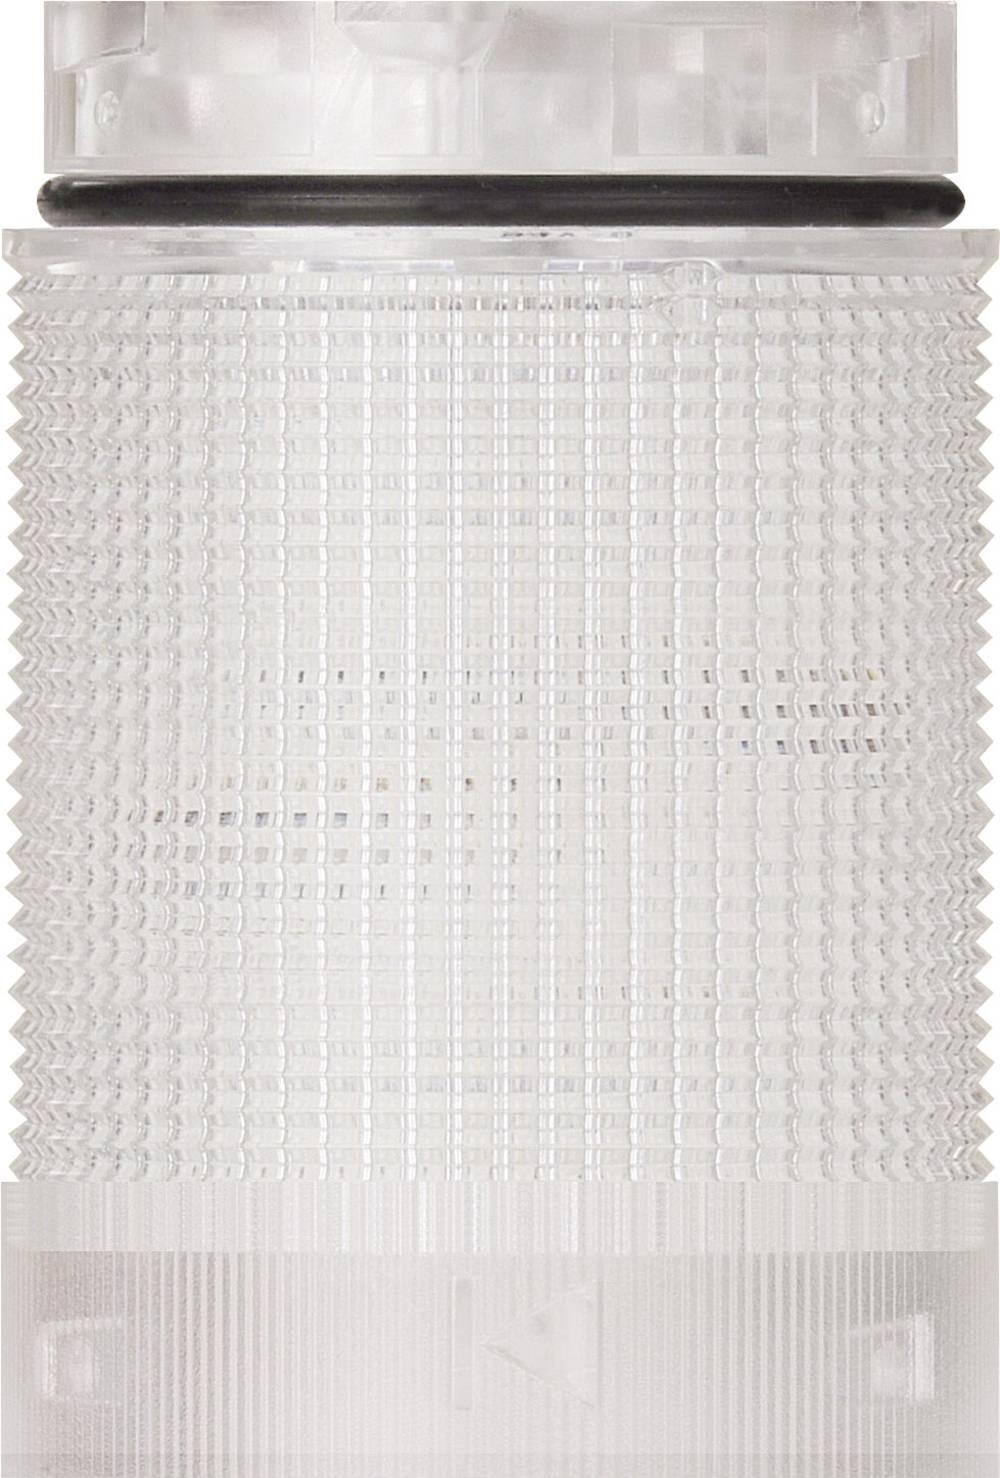 Signalni stolp LED Werma Signaltechnik KomdoIGN 40 TwinFLASH cl bele barve bliskavica 24 V/DC